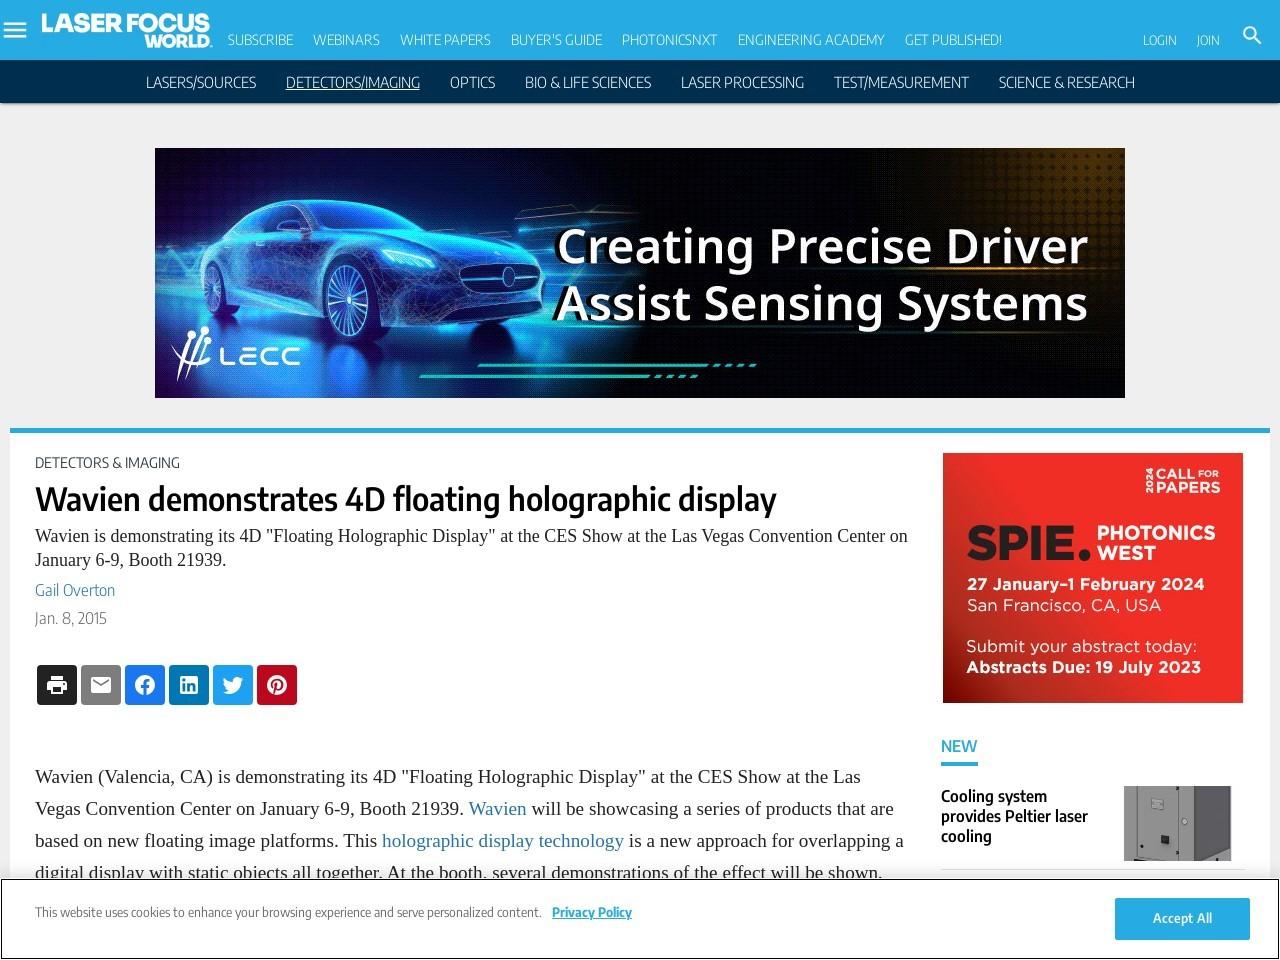 Wavien demonstrates 4D floating holographic display